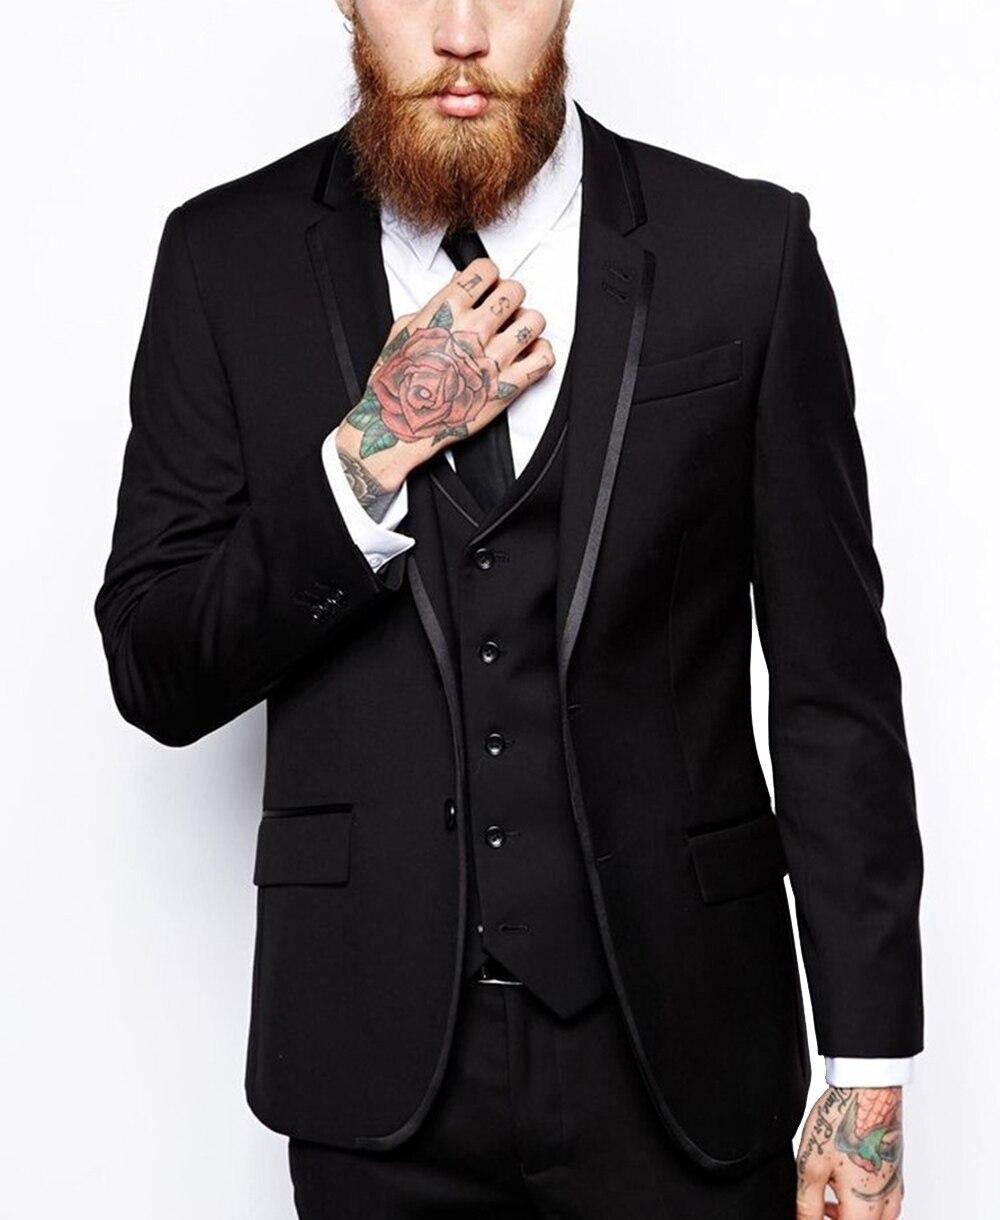 Black Mens Suit 3 Pieces Formal Business Blazer Notch Lapel Groomsmen For Wedding Suit 2020 New (Blazer+Vest+Pants) notch collar pleated panel blazer